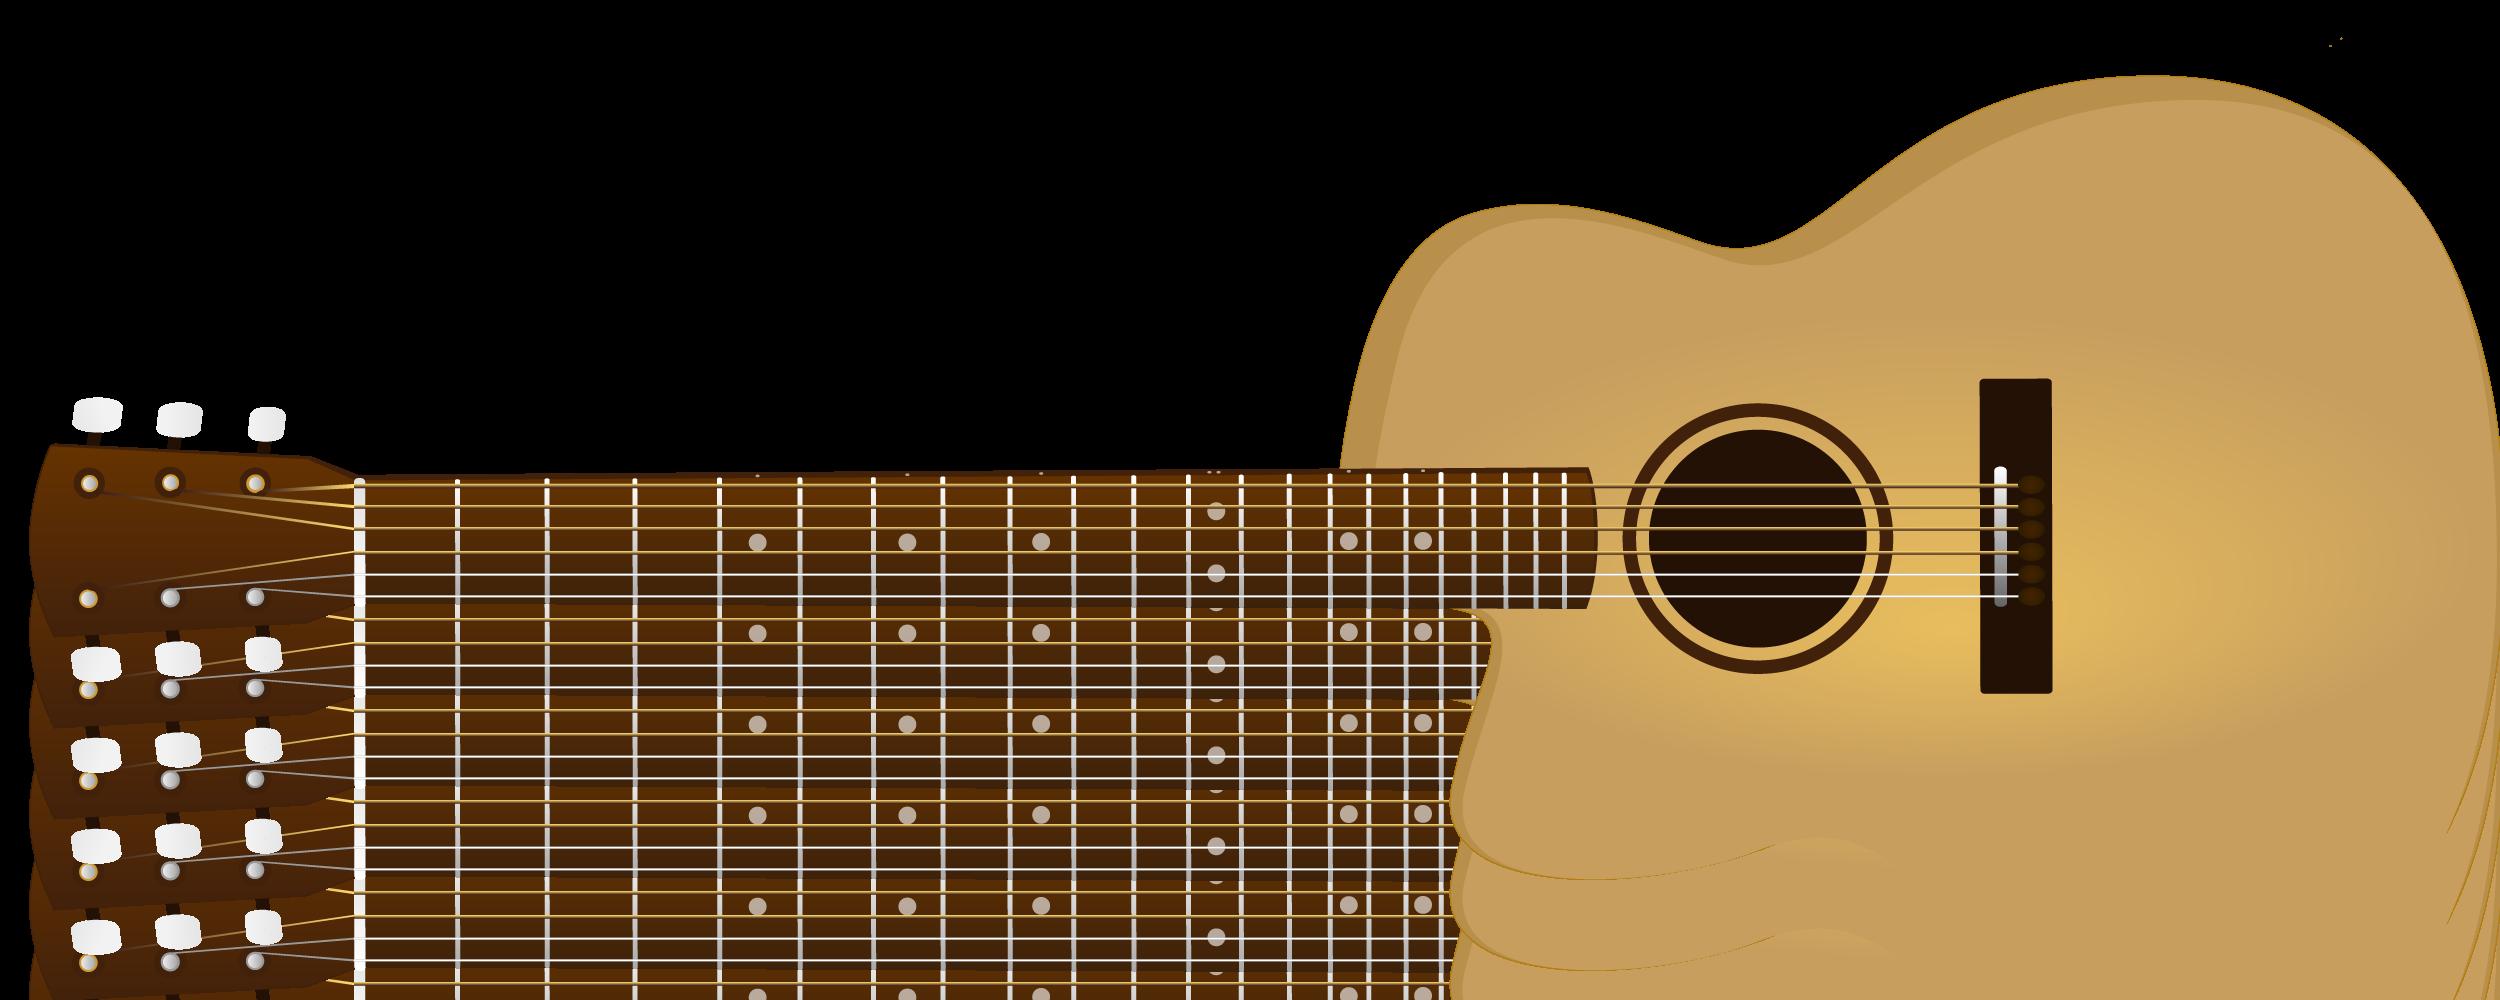 Acoustic HD PNG - 89249